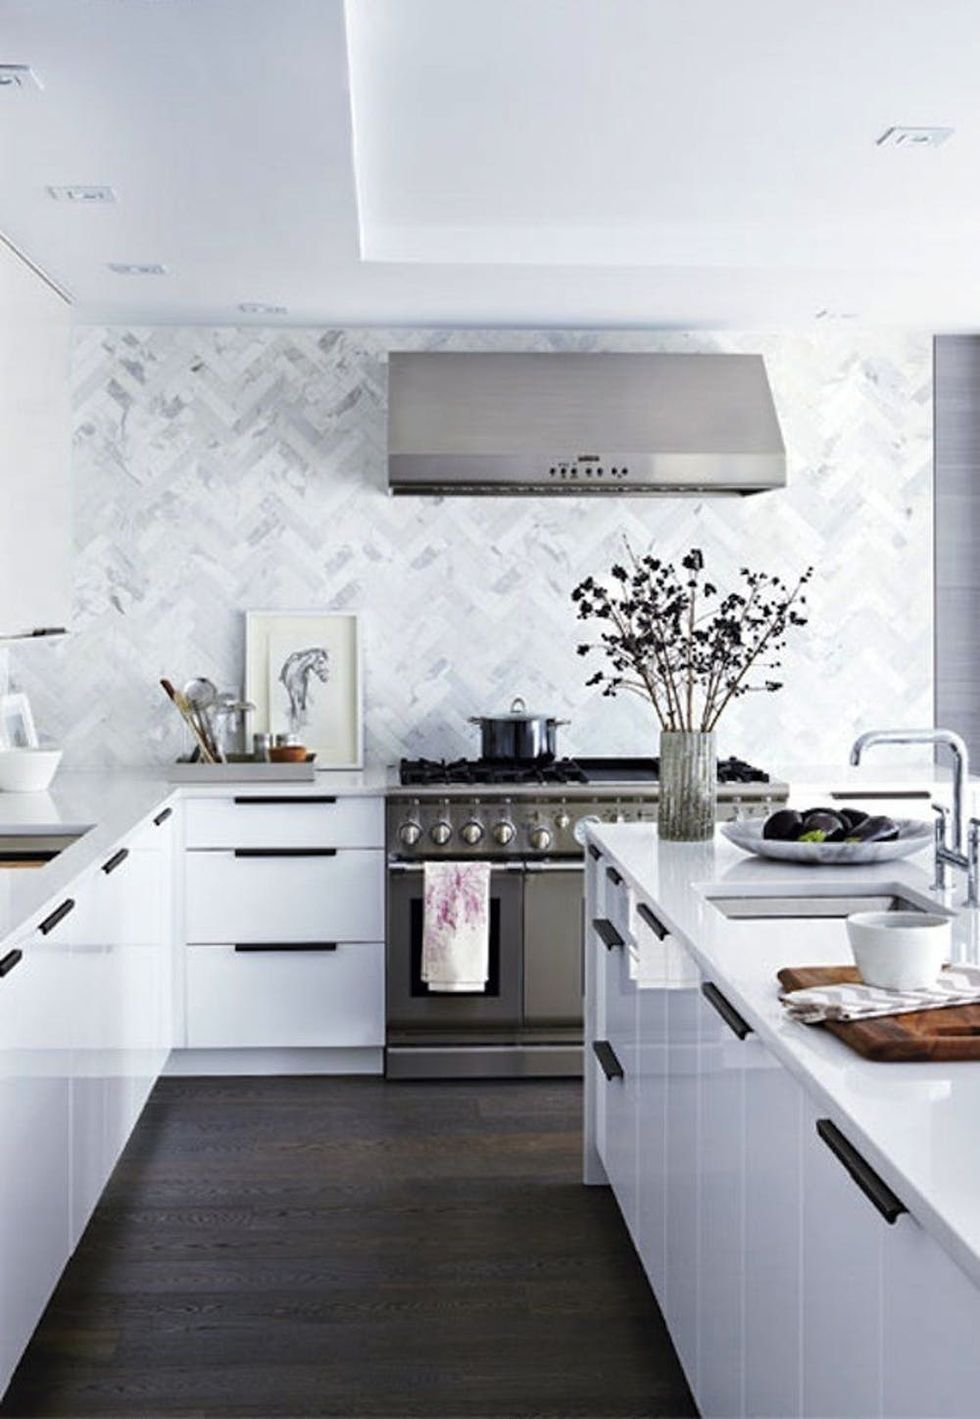 8 Modern + Affordable IKEA Kitchen Makeovers - Brit + Co